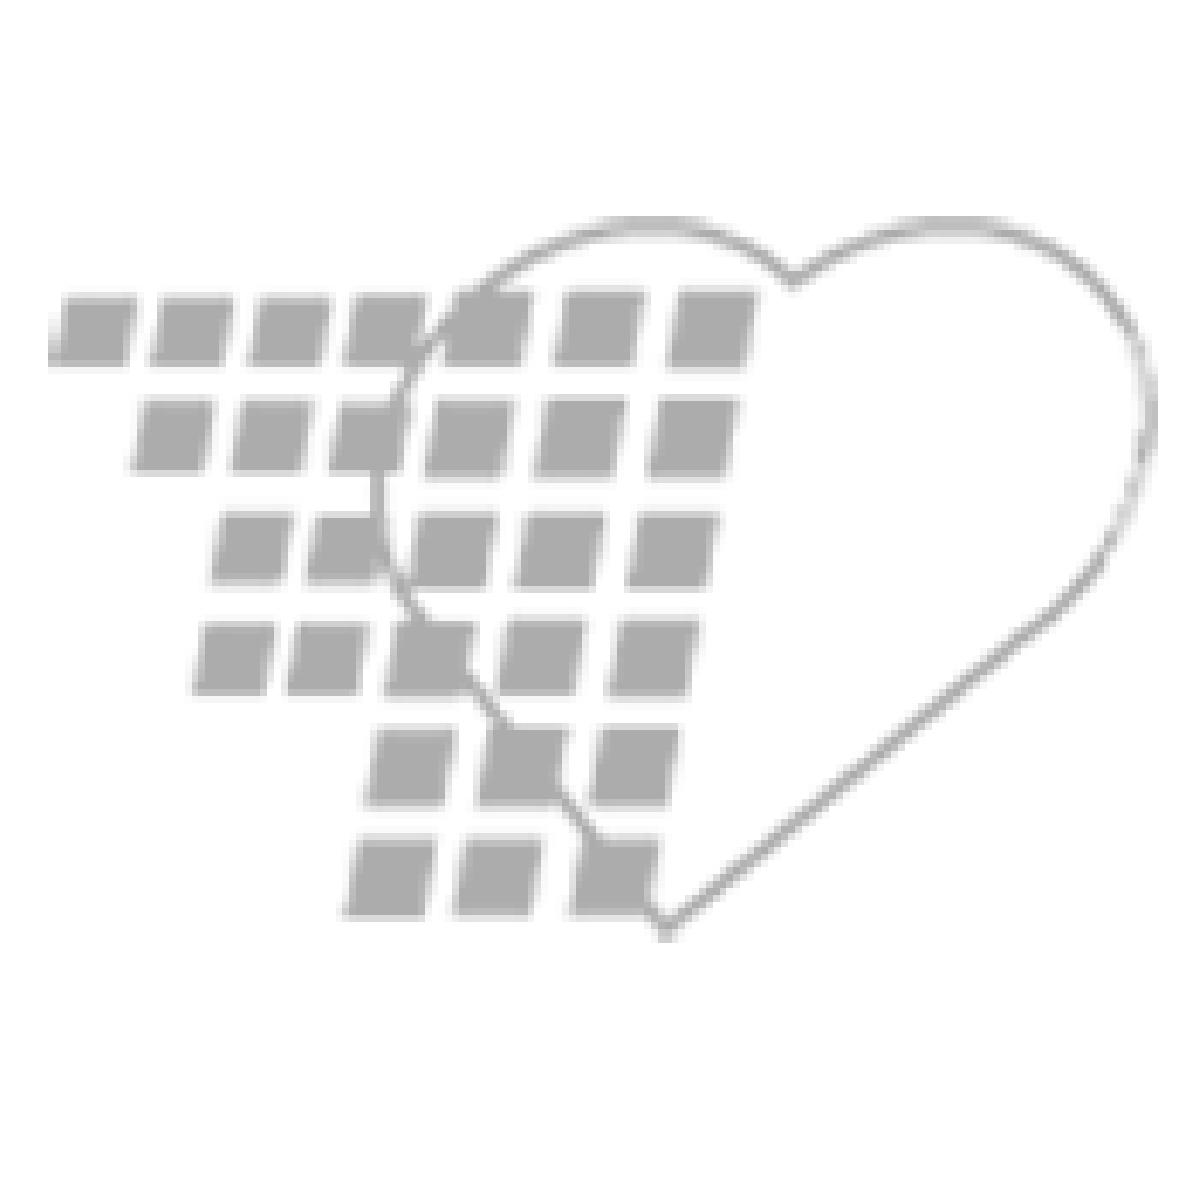 07-71-3205 Pocket Nurse® Suction Catheter Kit Non-Sterile with 2 Gloves